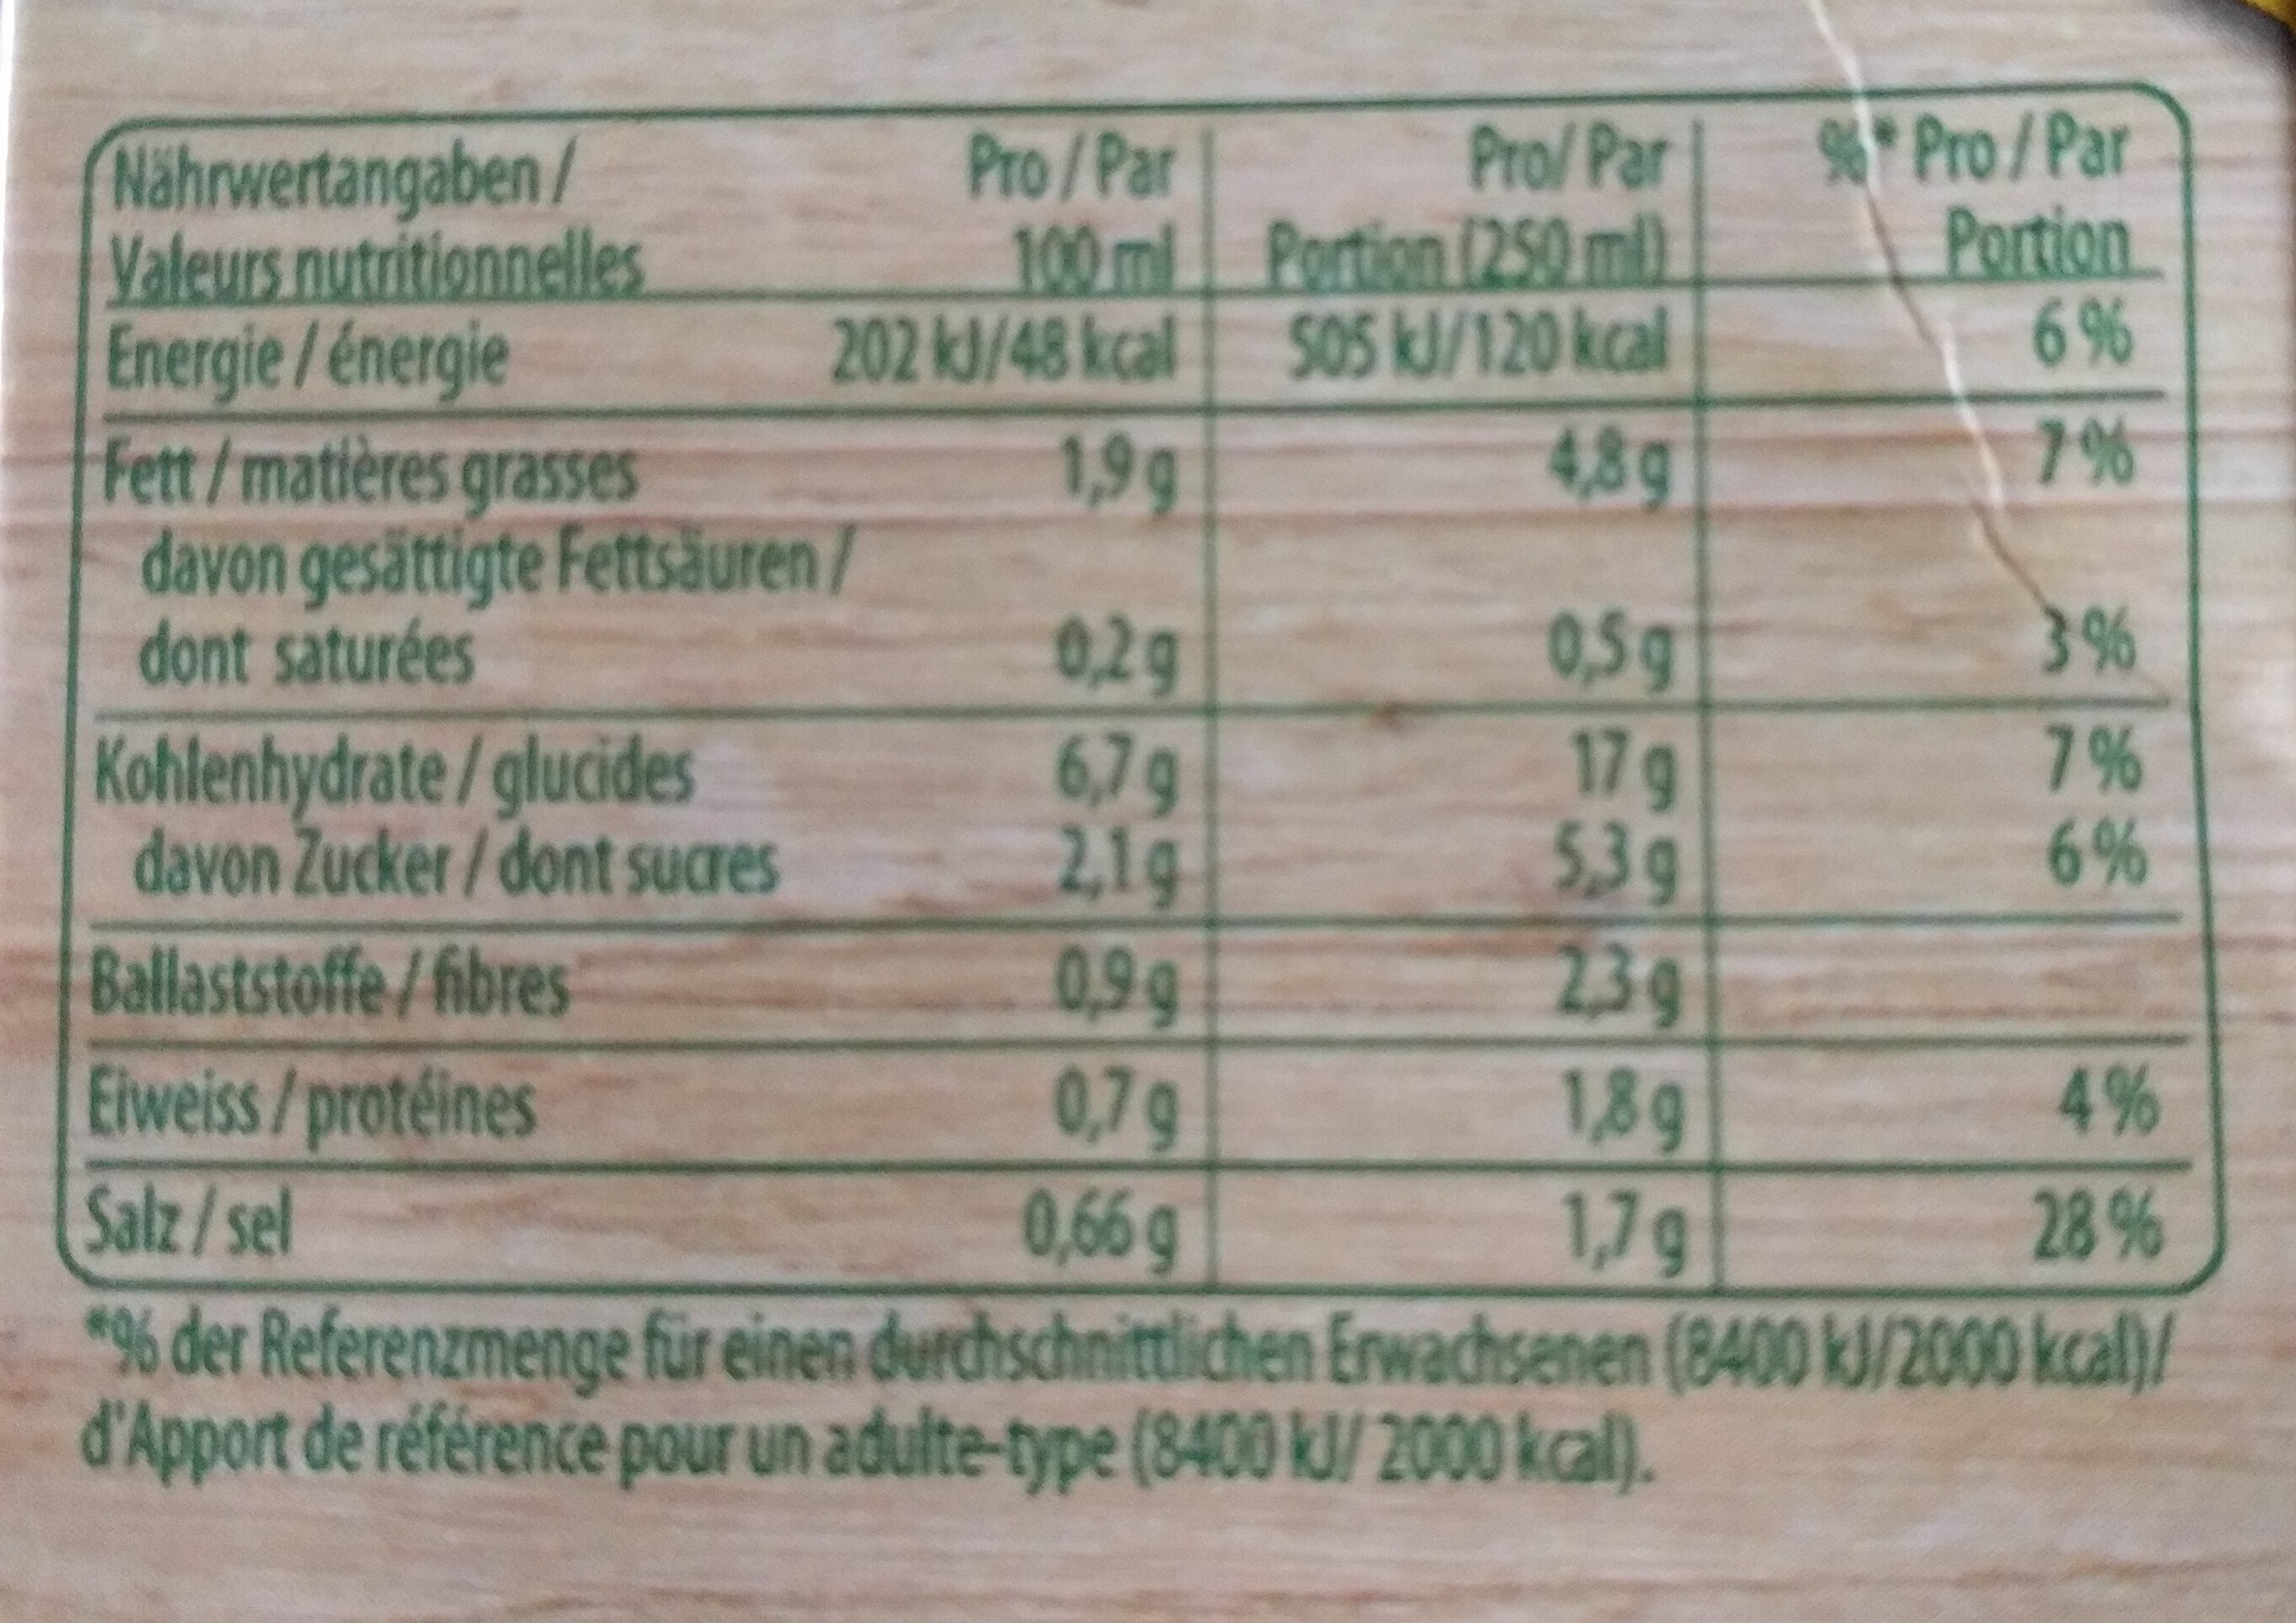 Cremesuppe mit 9 Gemüsen - Voedingswaarden - fr